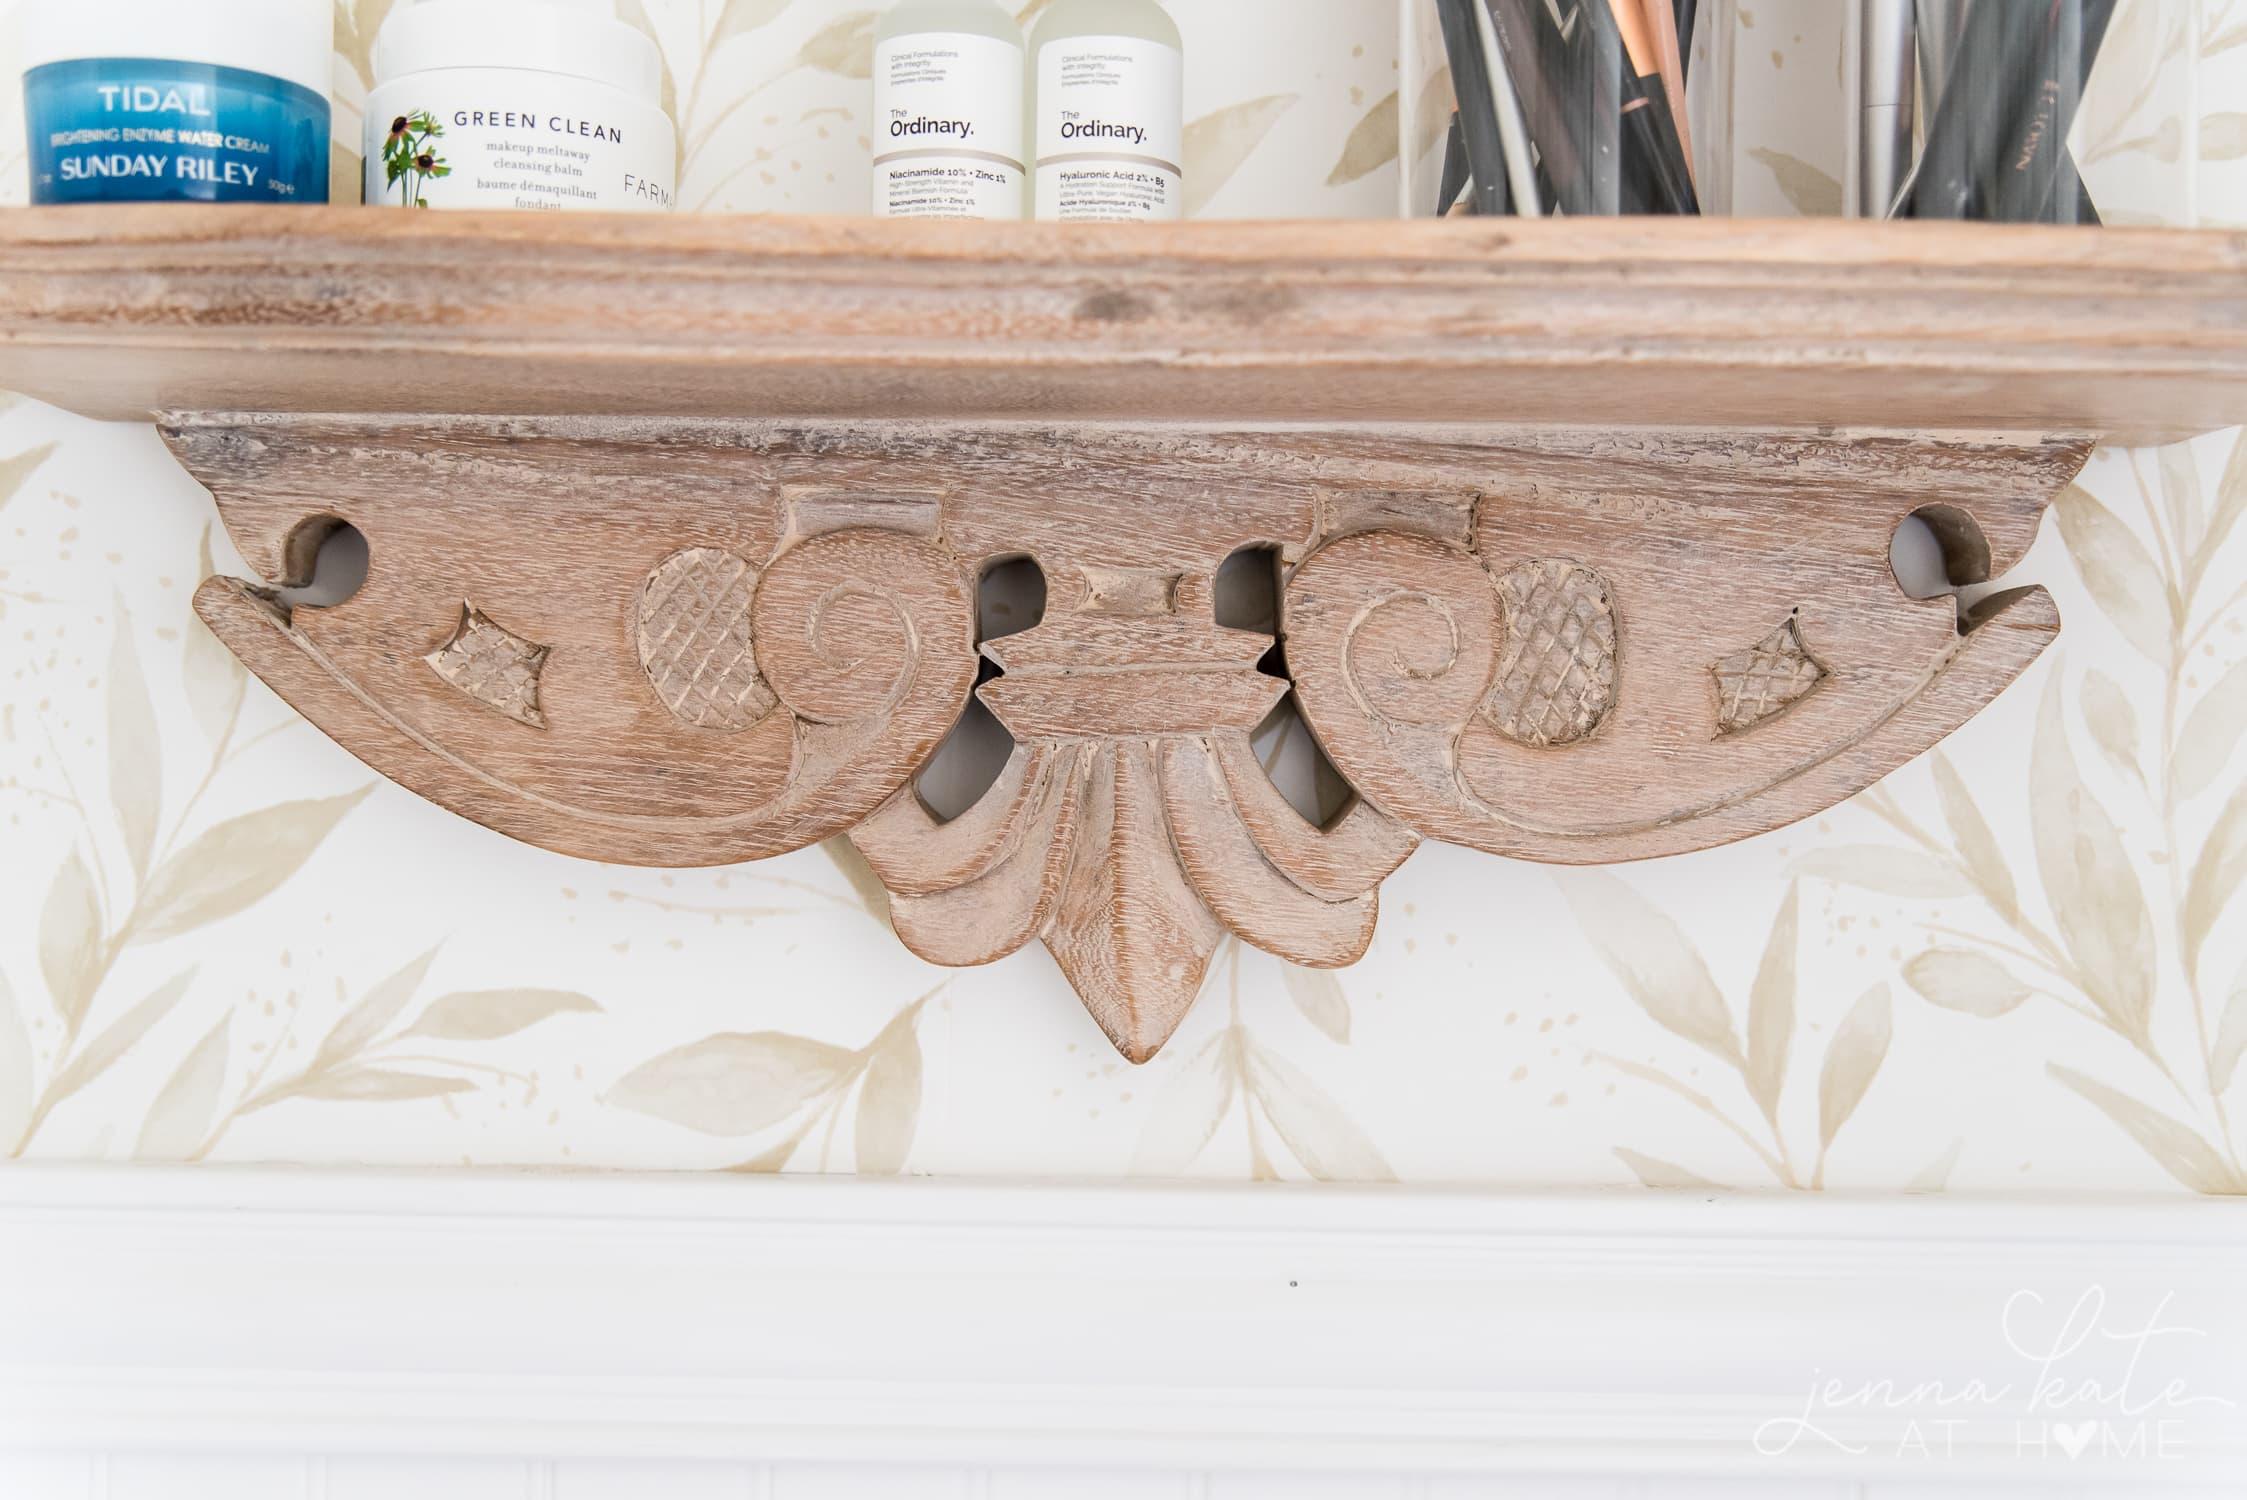 Closeup of carved details on the natural wood bathroom shelf